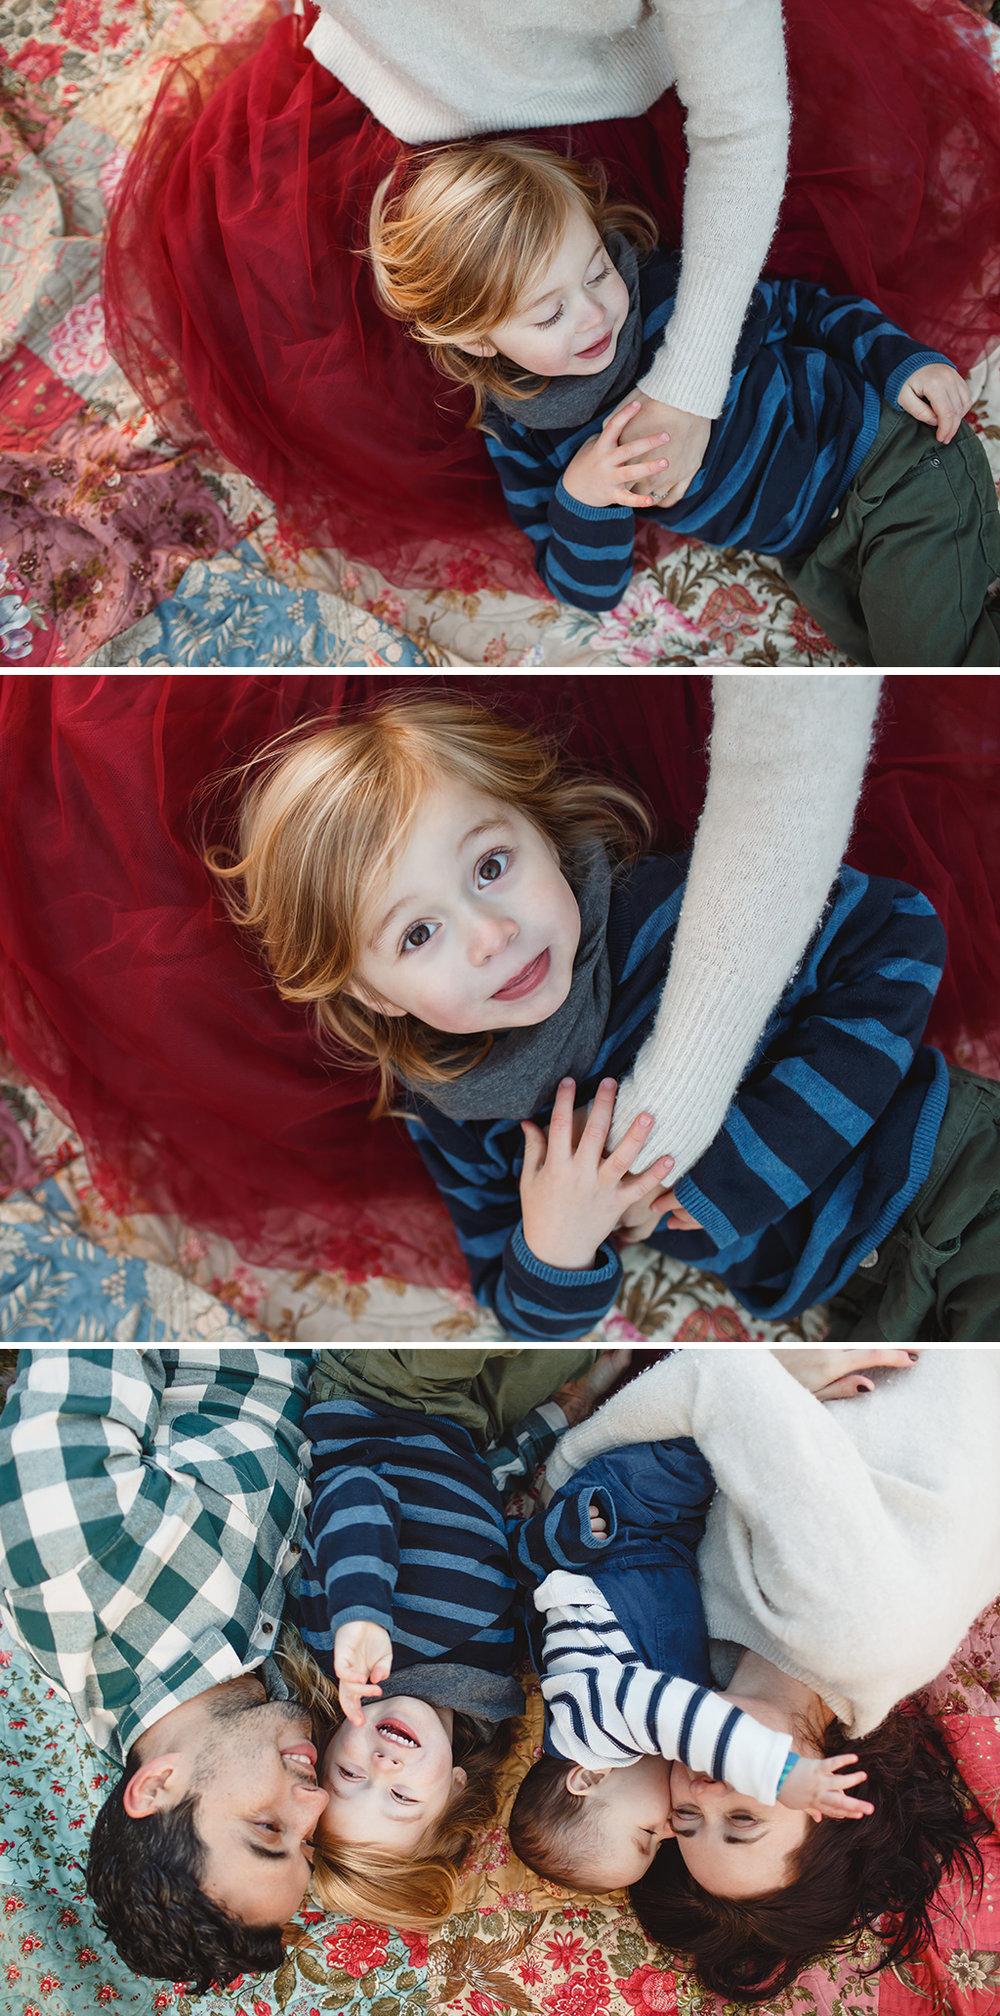 Hostfotografering-i-november-familjefotografering-Stockholm-12.jpg